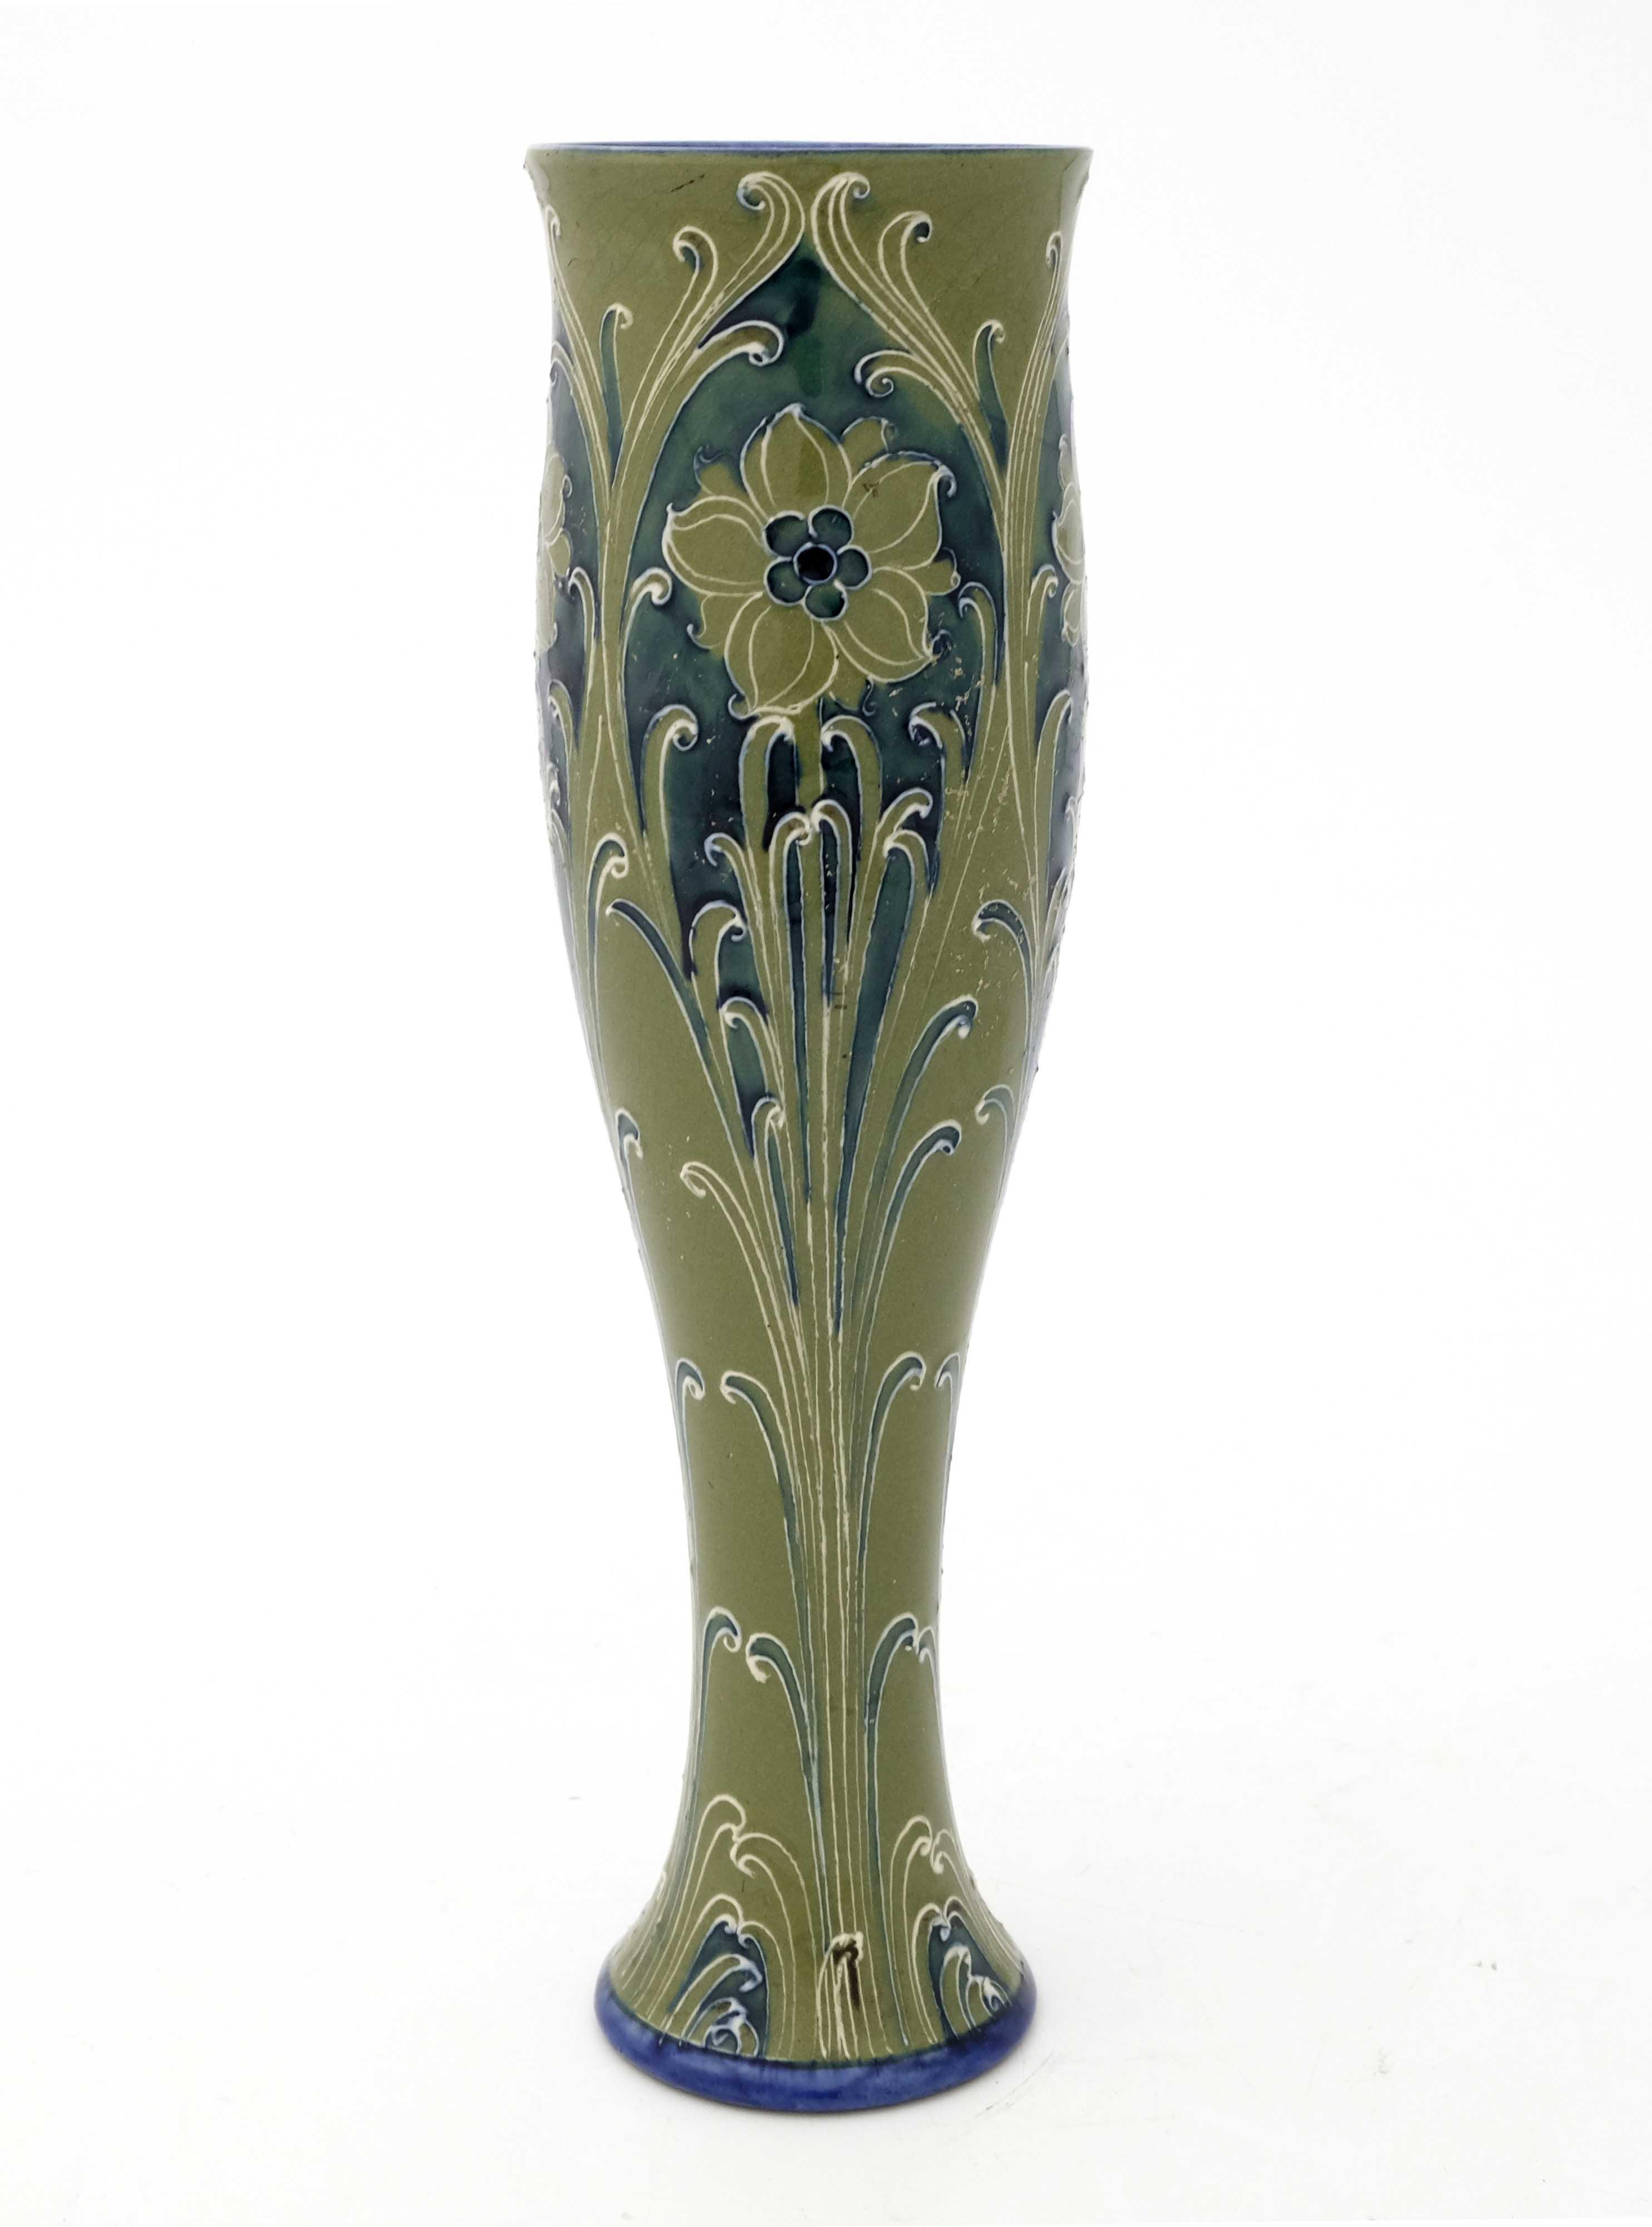 William Moorcroft for James MacIntyre, a Daffodil